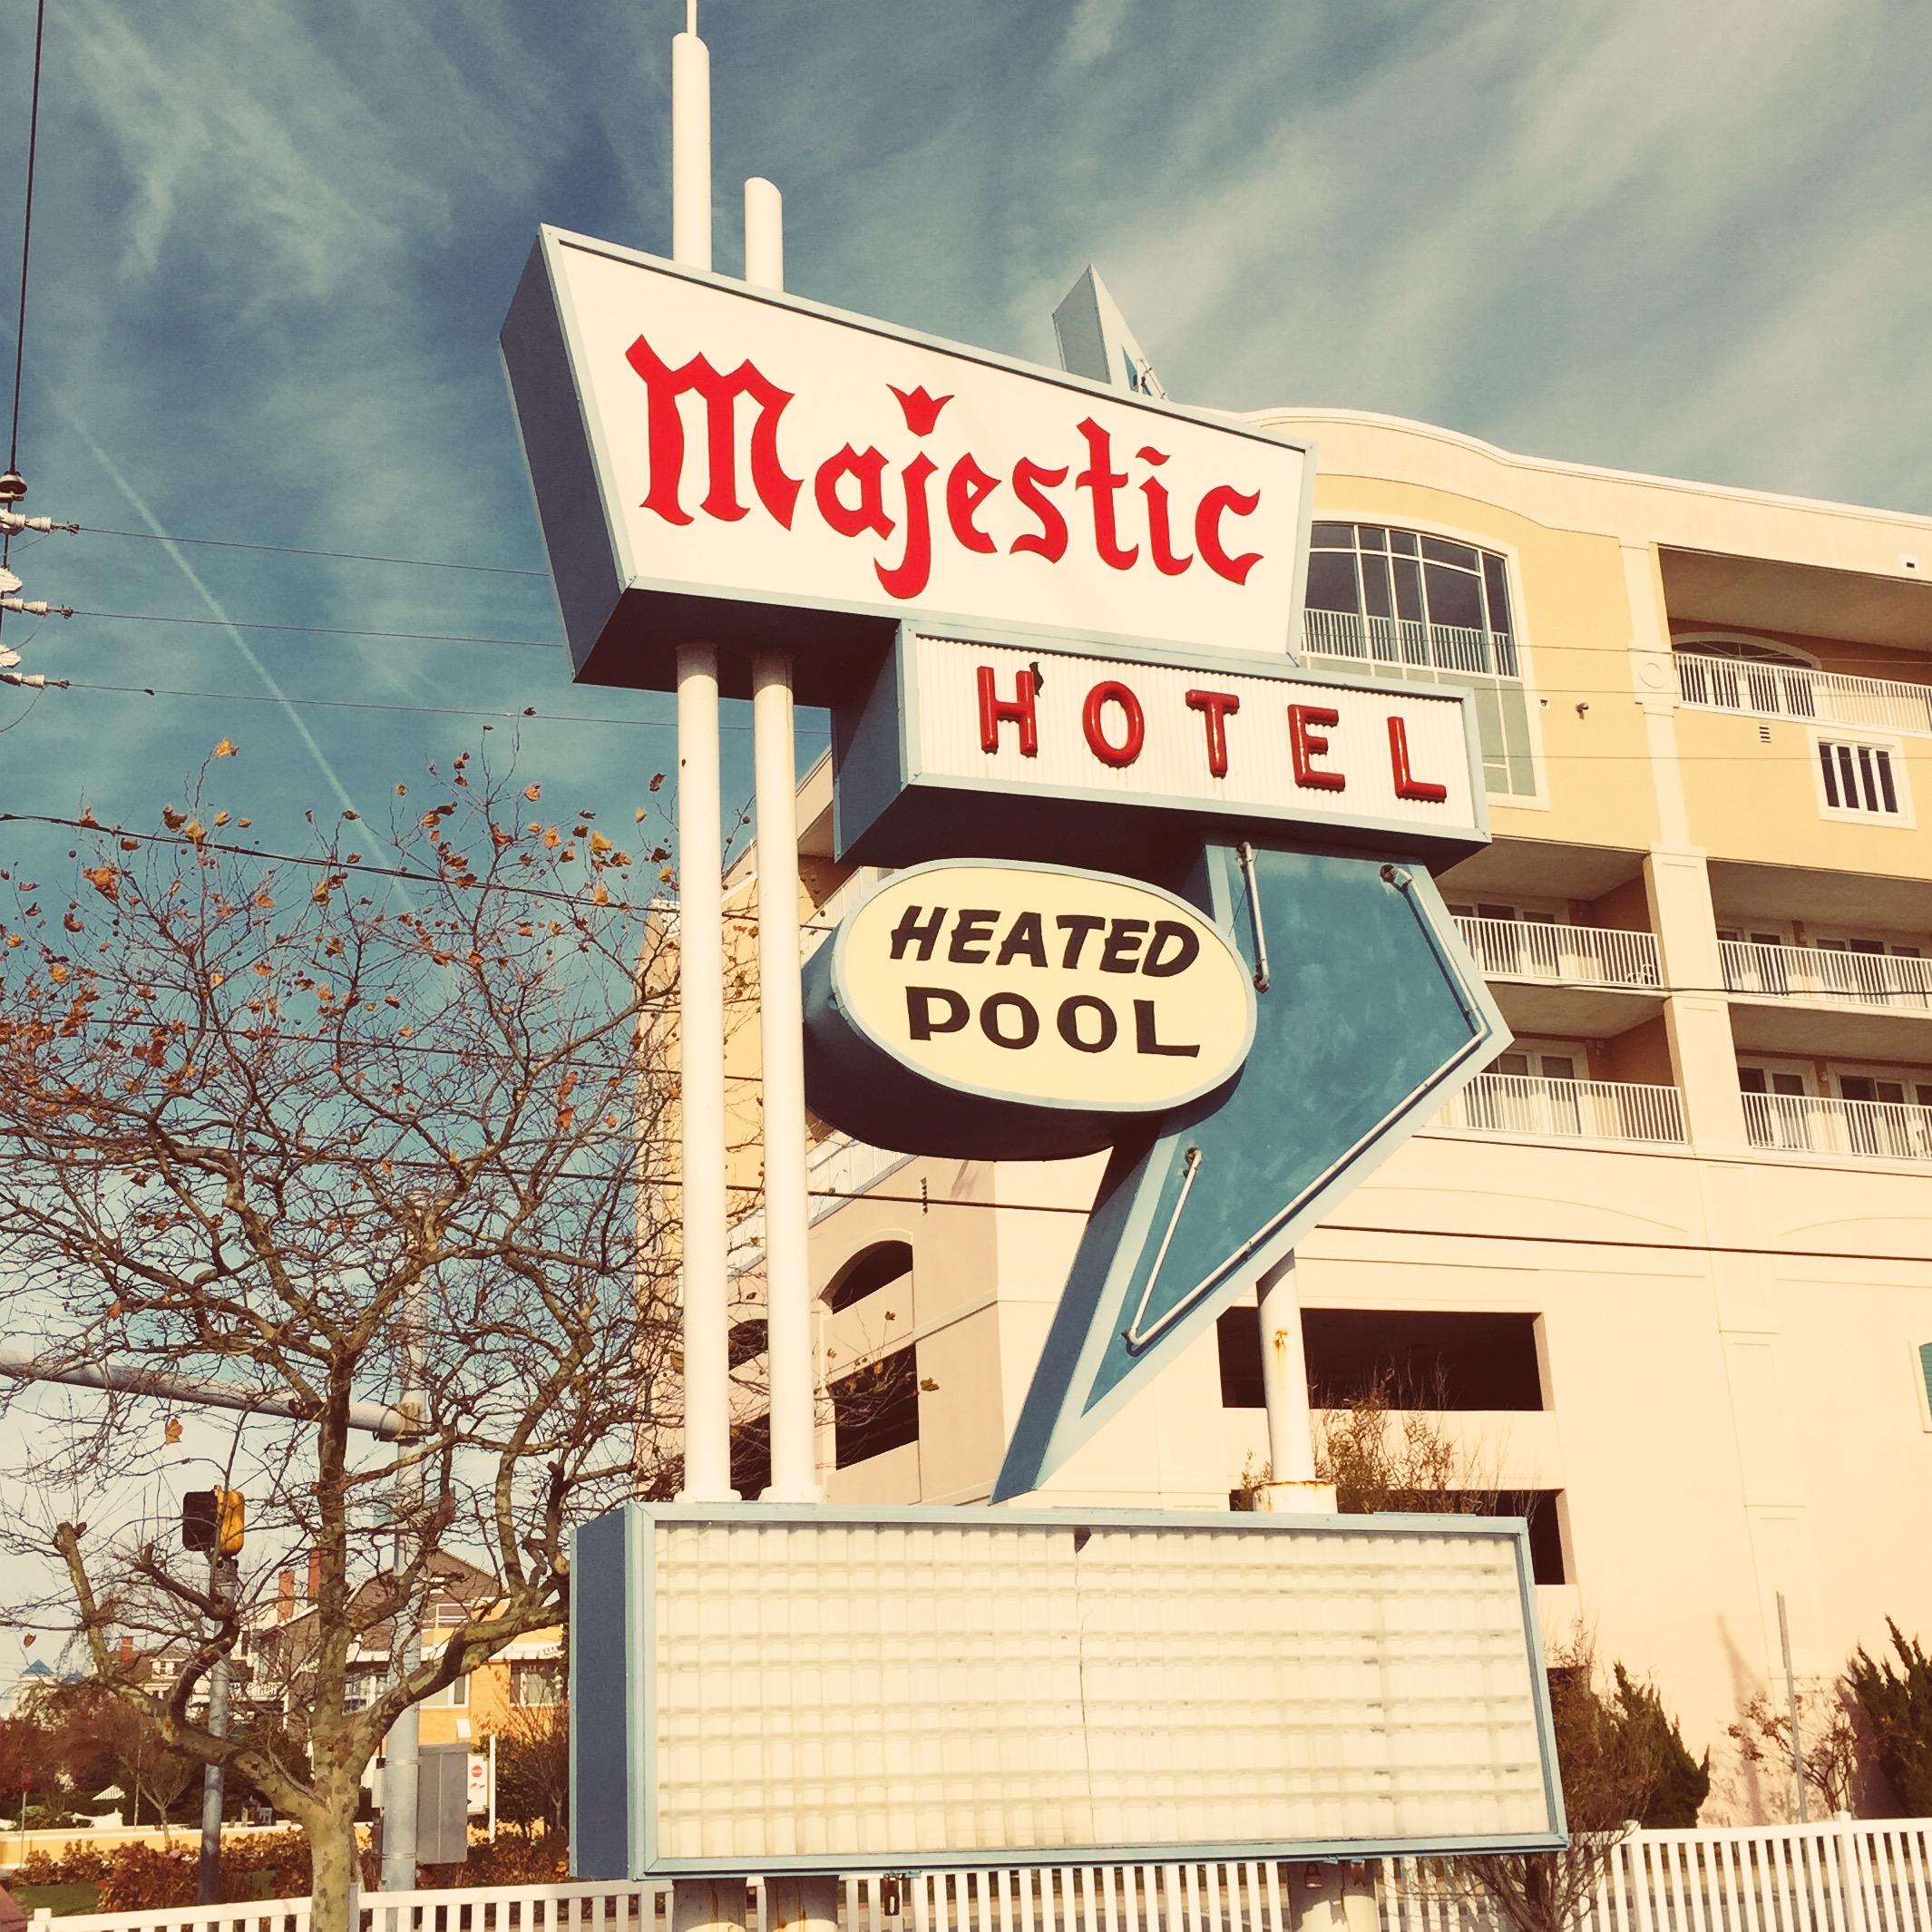 Majestic Hotel - 7th Street Ocean City, Maryland 2014